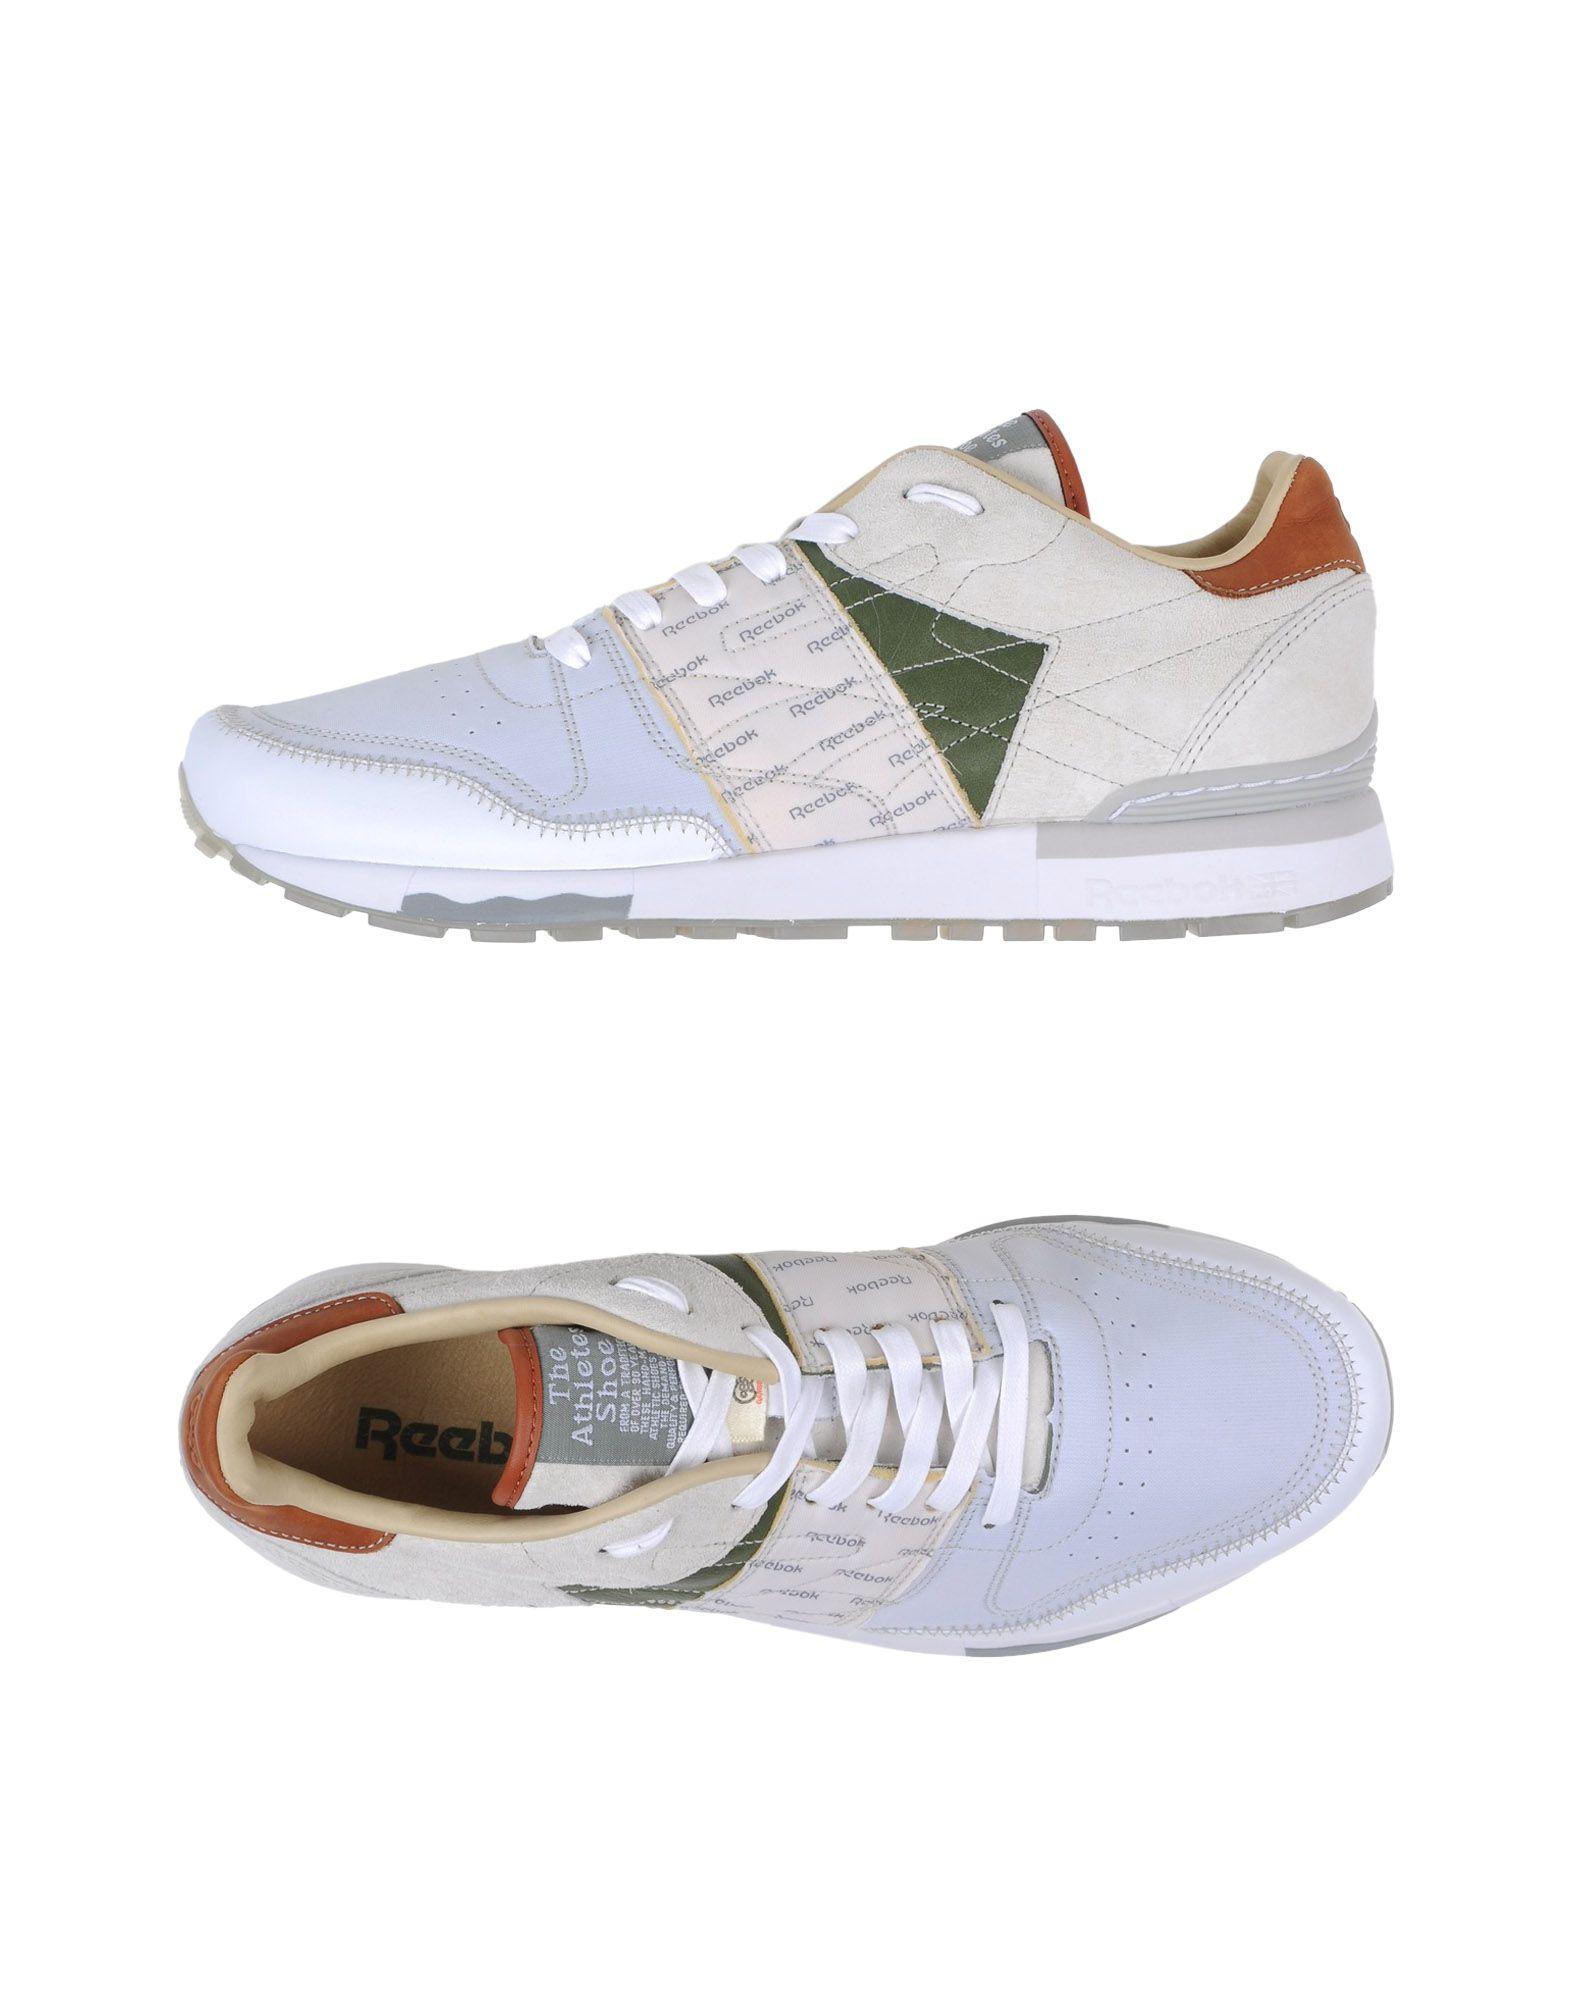 Sneakers Reebok Gs Cl Lthr 6000 Lth - Homme - Sneakers Reebok sur